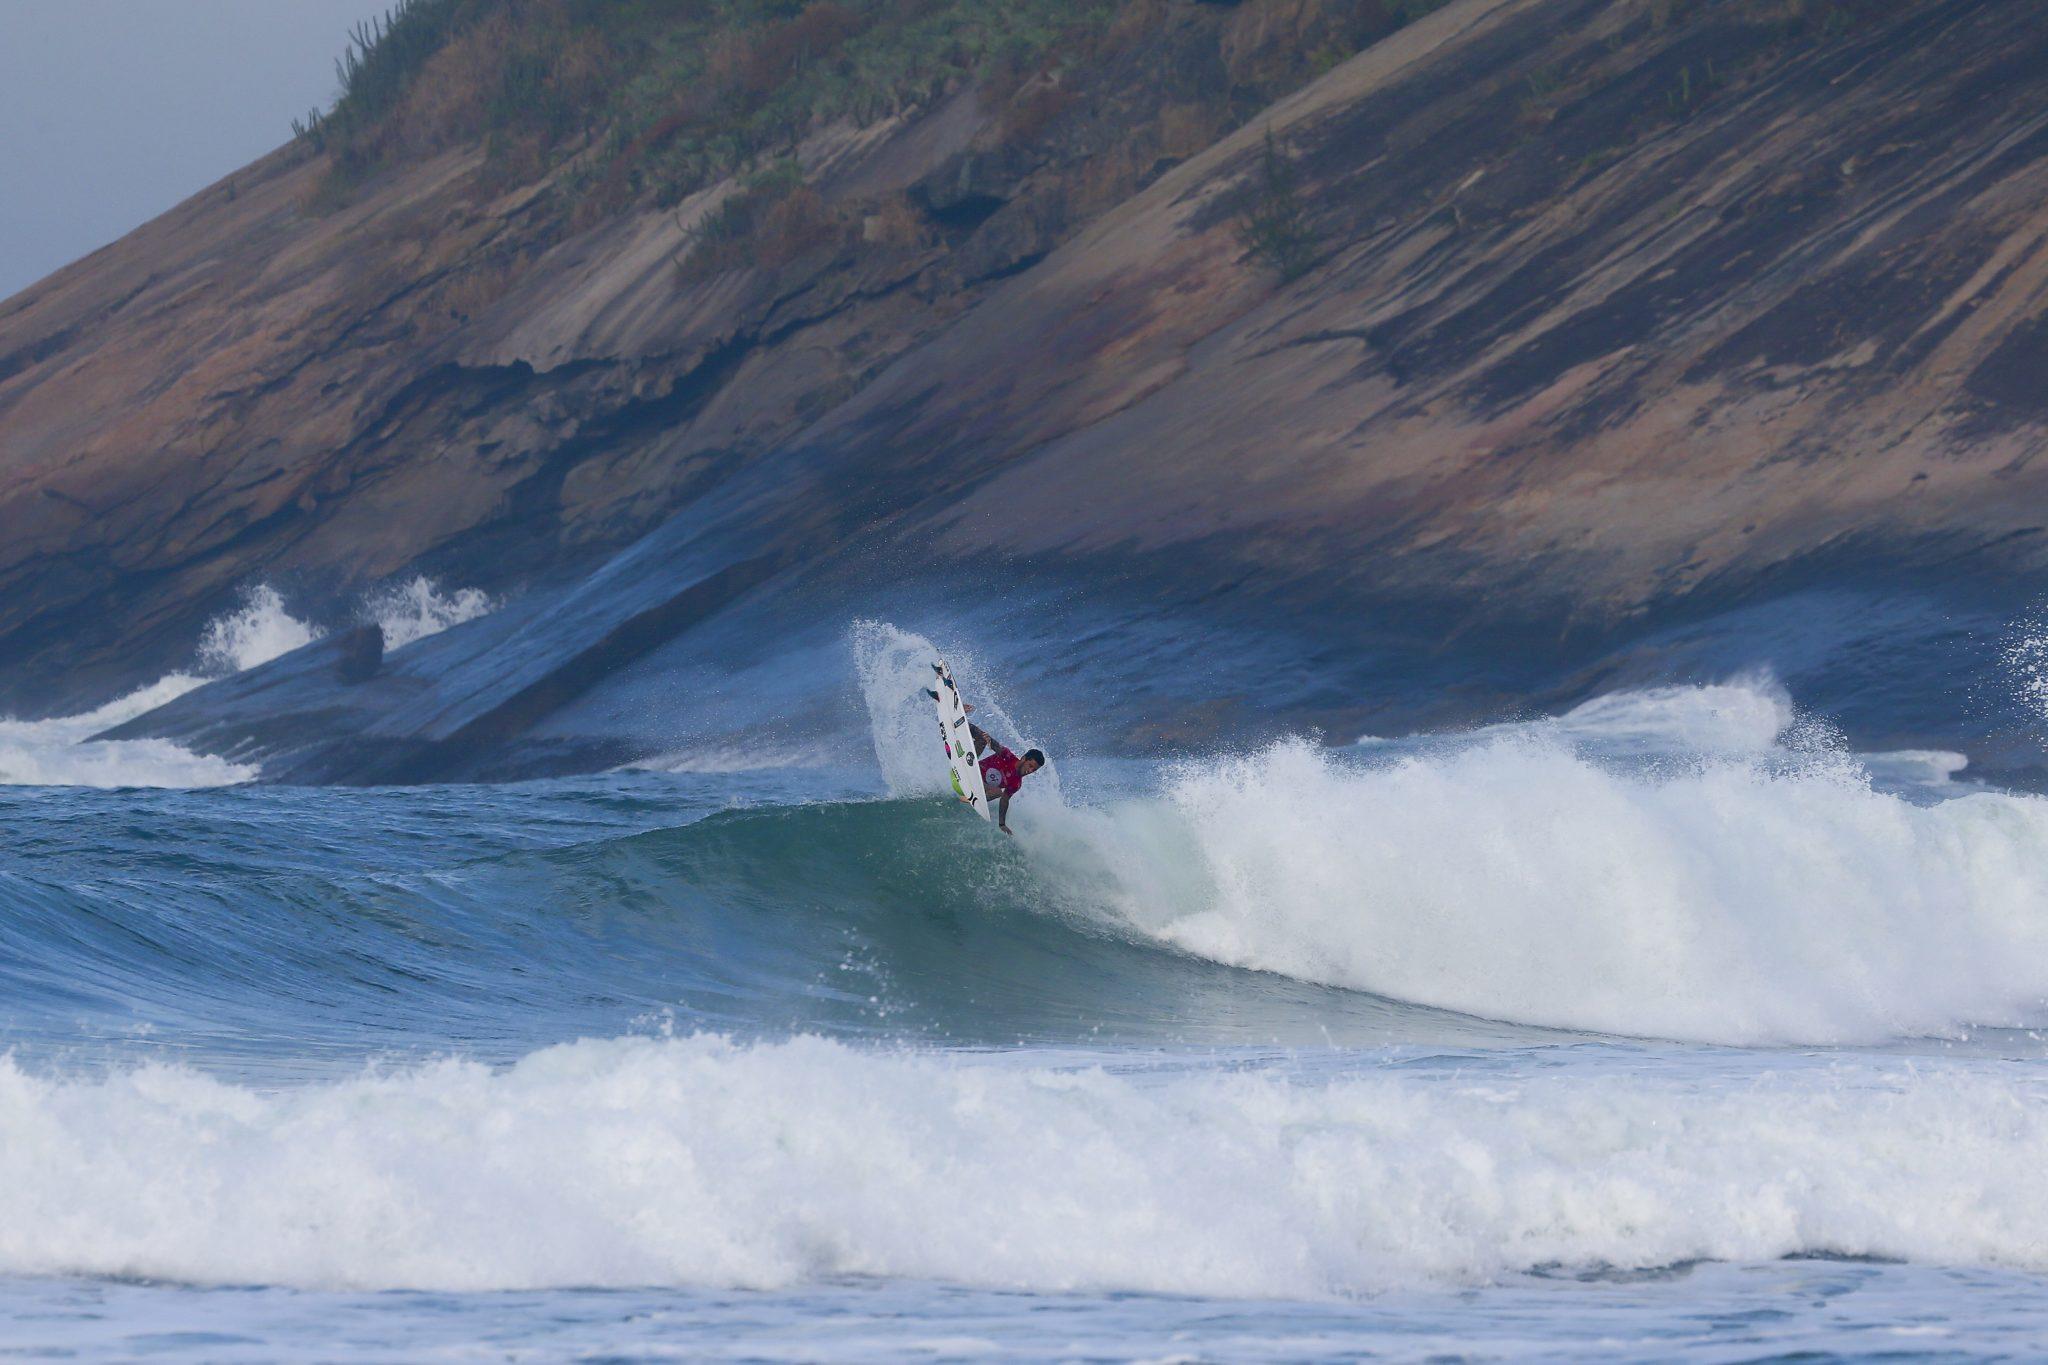 Filipe Toledo (SP) / Foto Smorigo